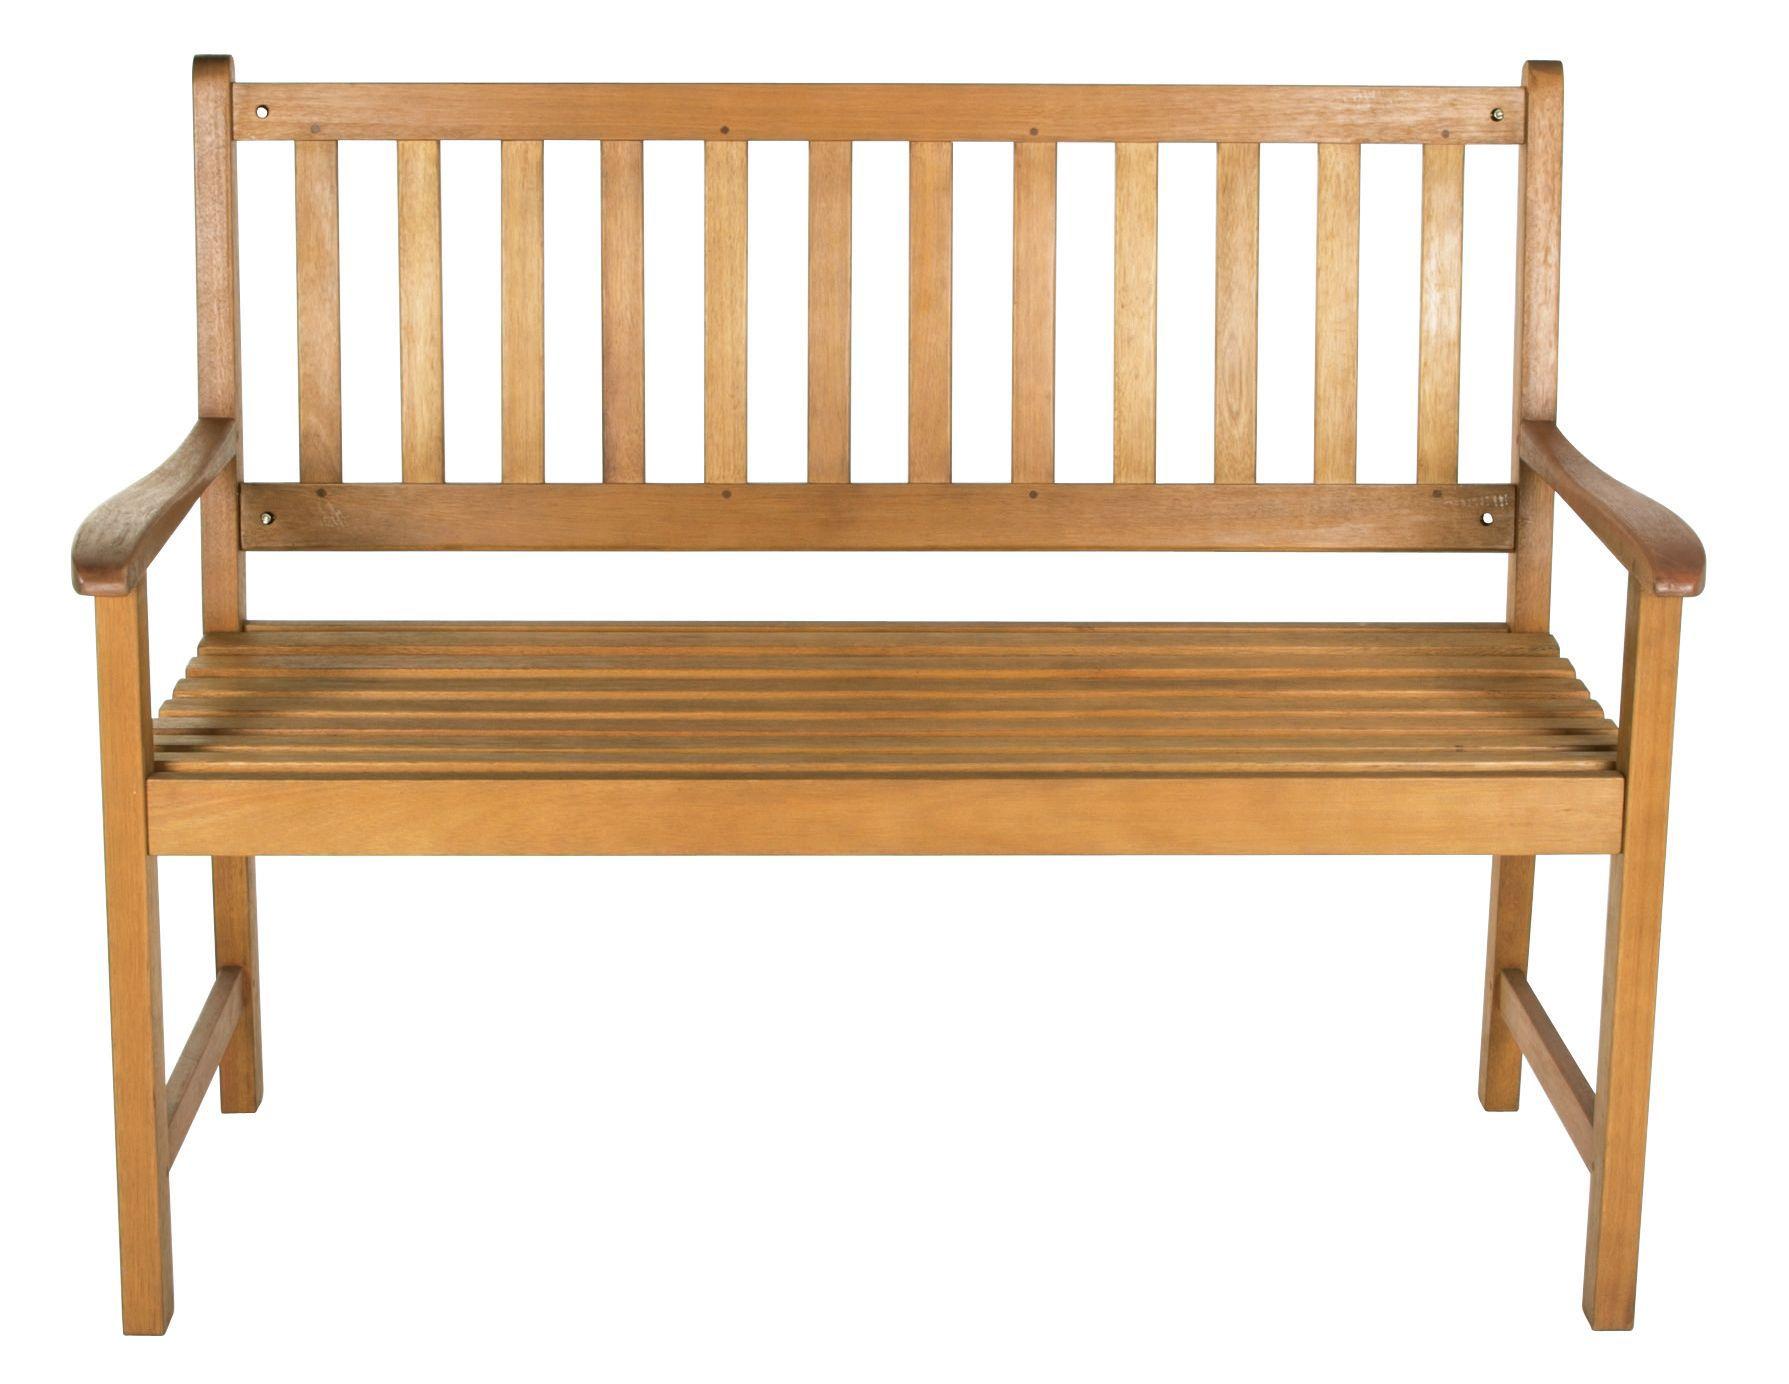 aland wooden bench departments diy at b q. Black Bedroom Furniture Sets. Home Design Ideas